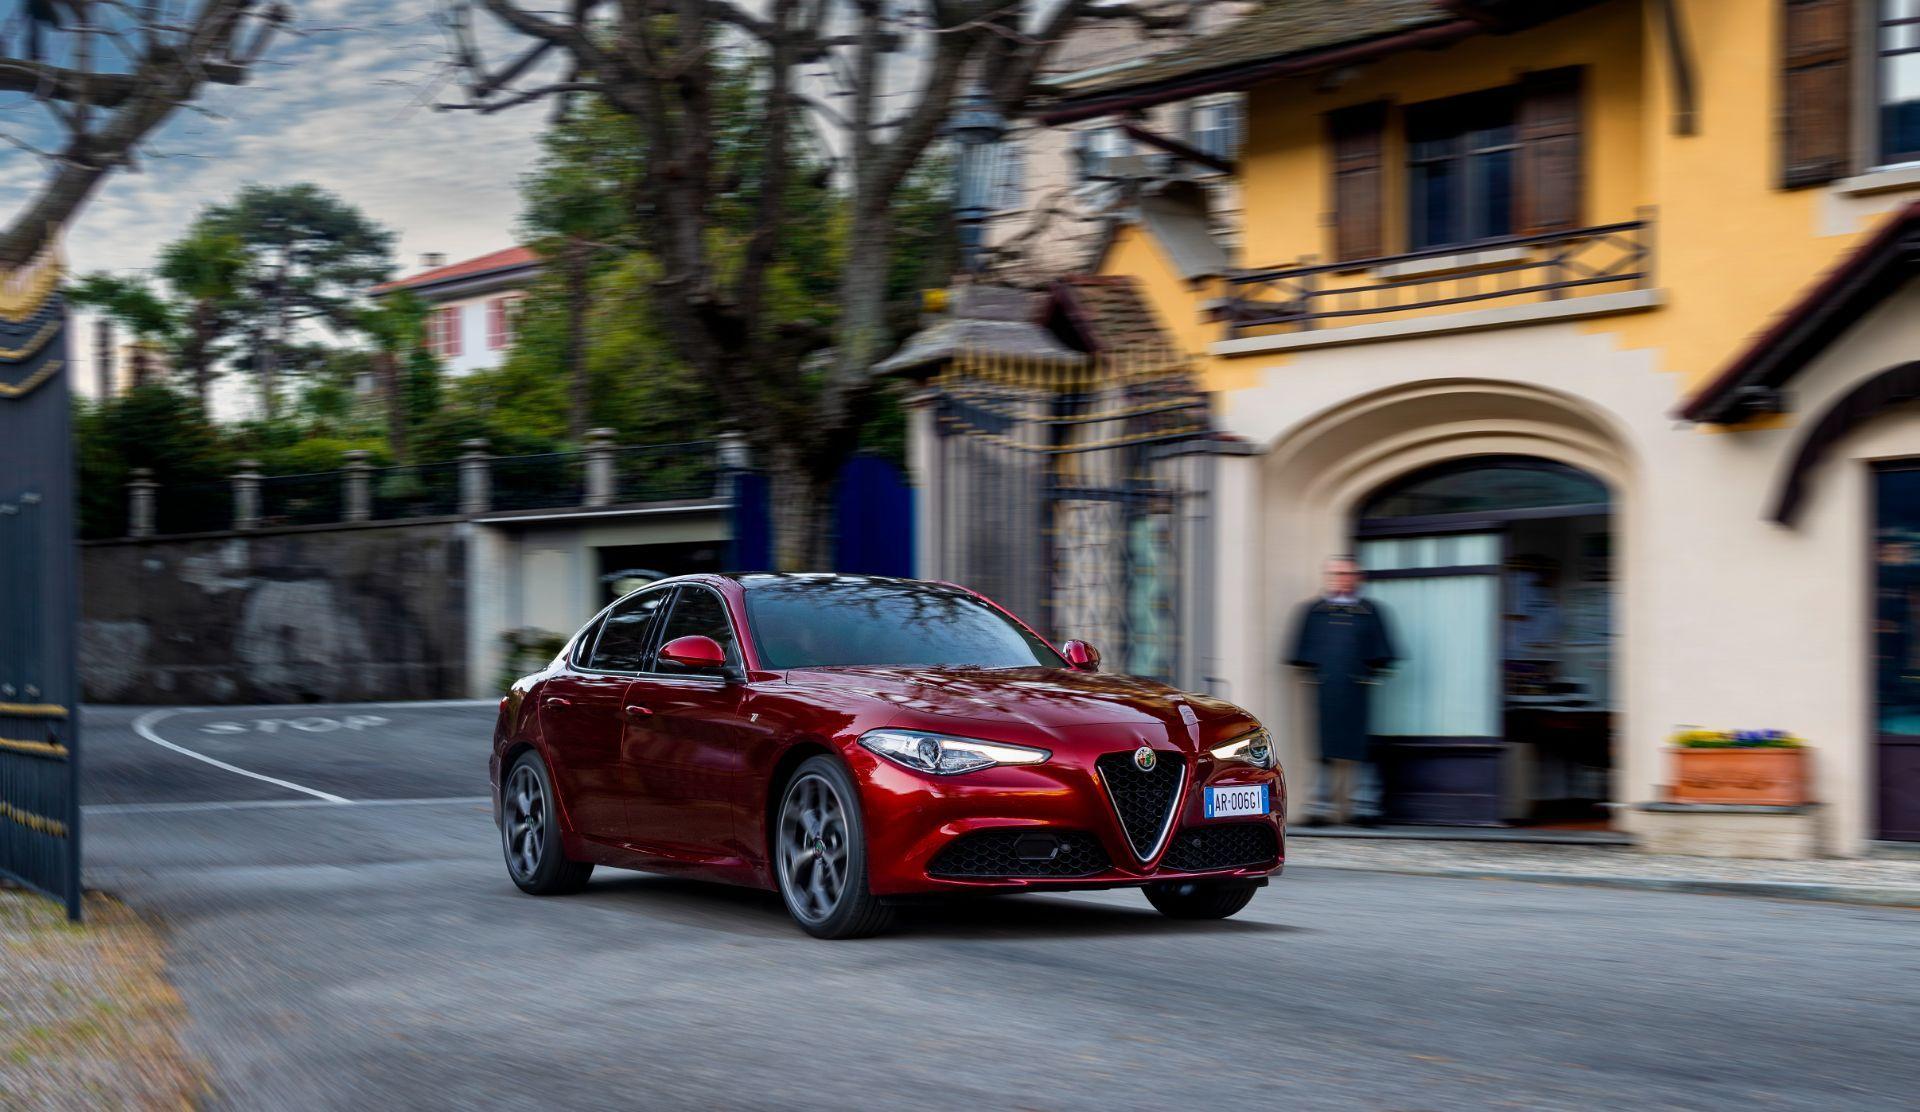 Alfa-Romeo-Giulia-and-Stelvio-6C-Villa-dEste-14